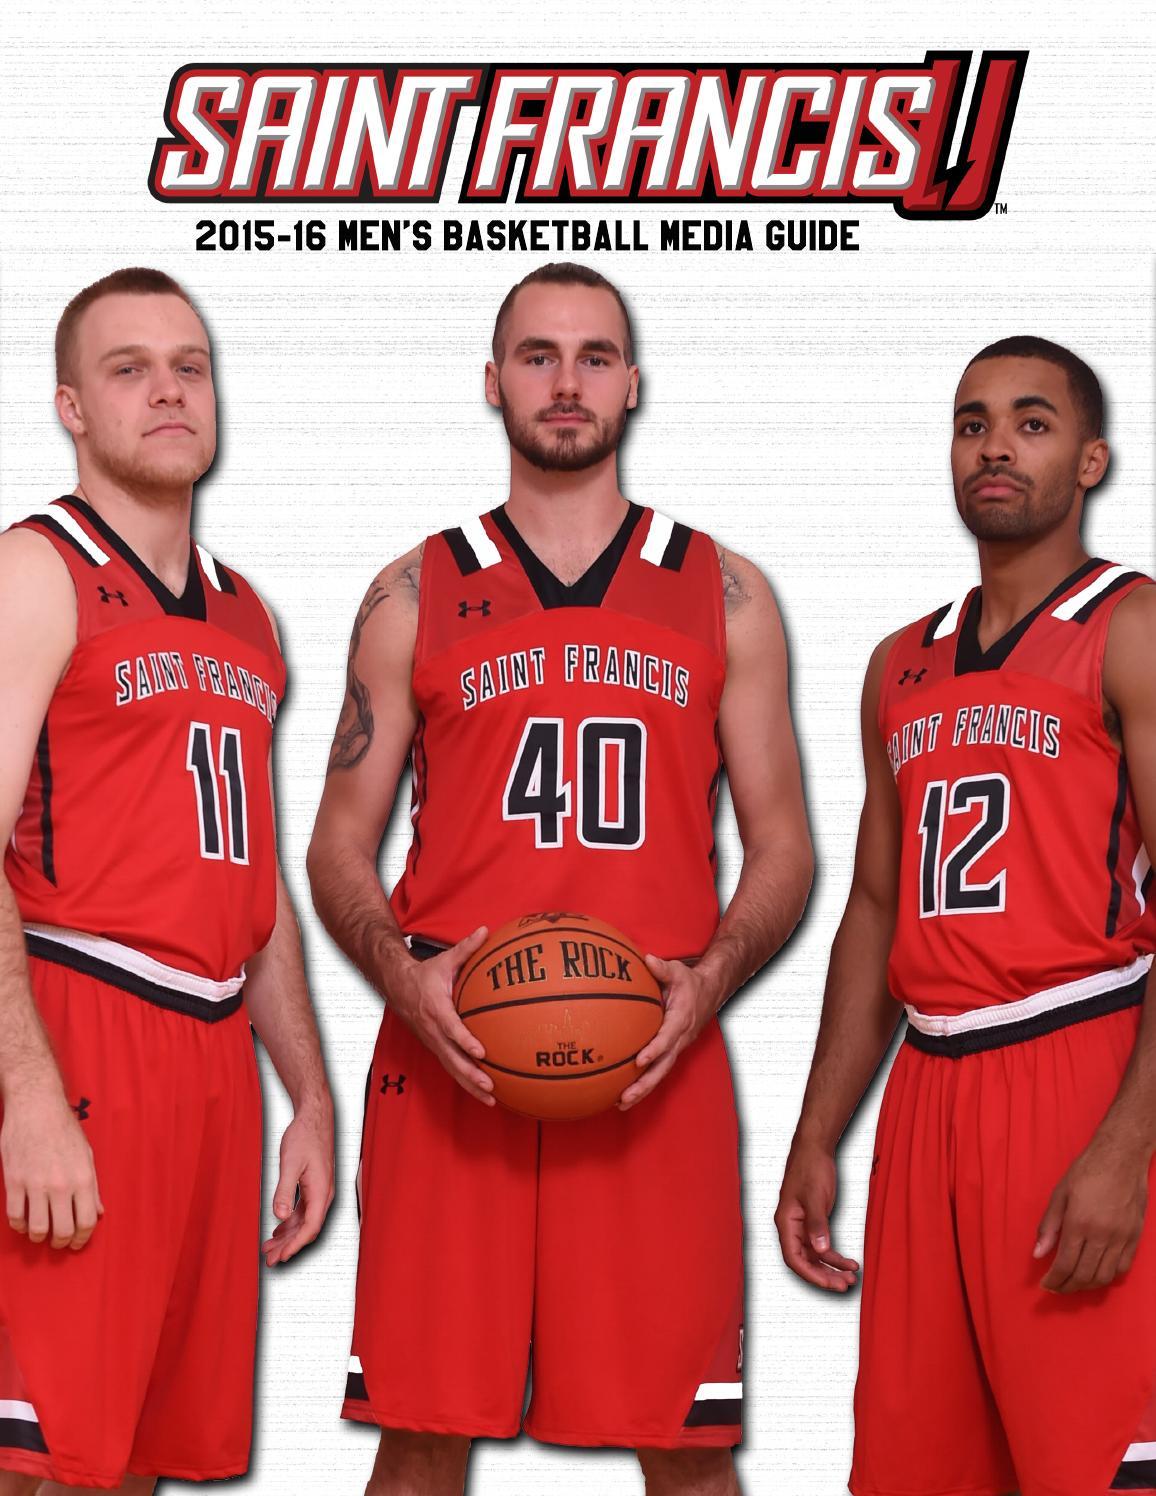 2015-16 Saint Francis Men's Basketball Media Guide by Saint Francis Red Flash - Issuu